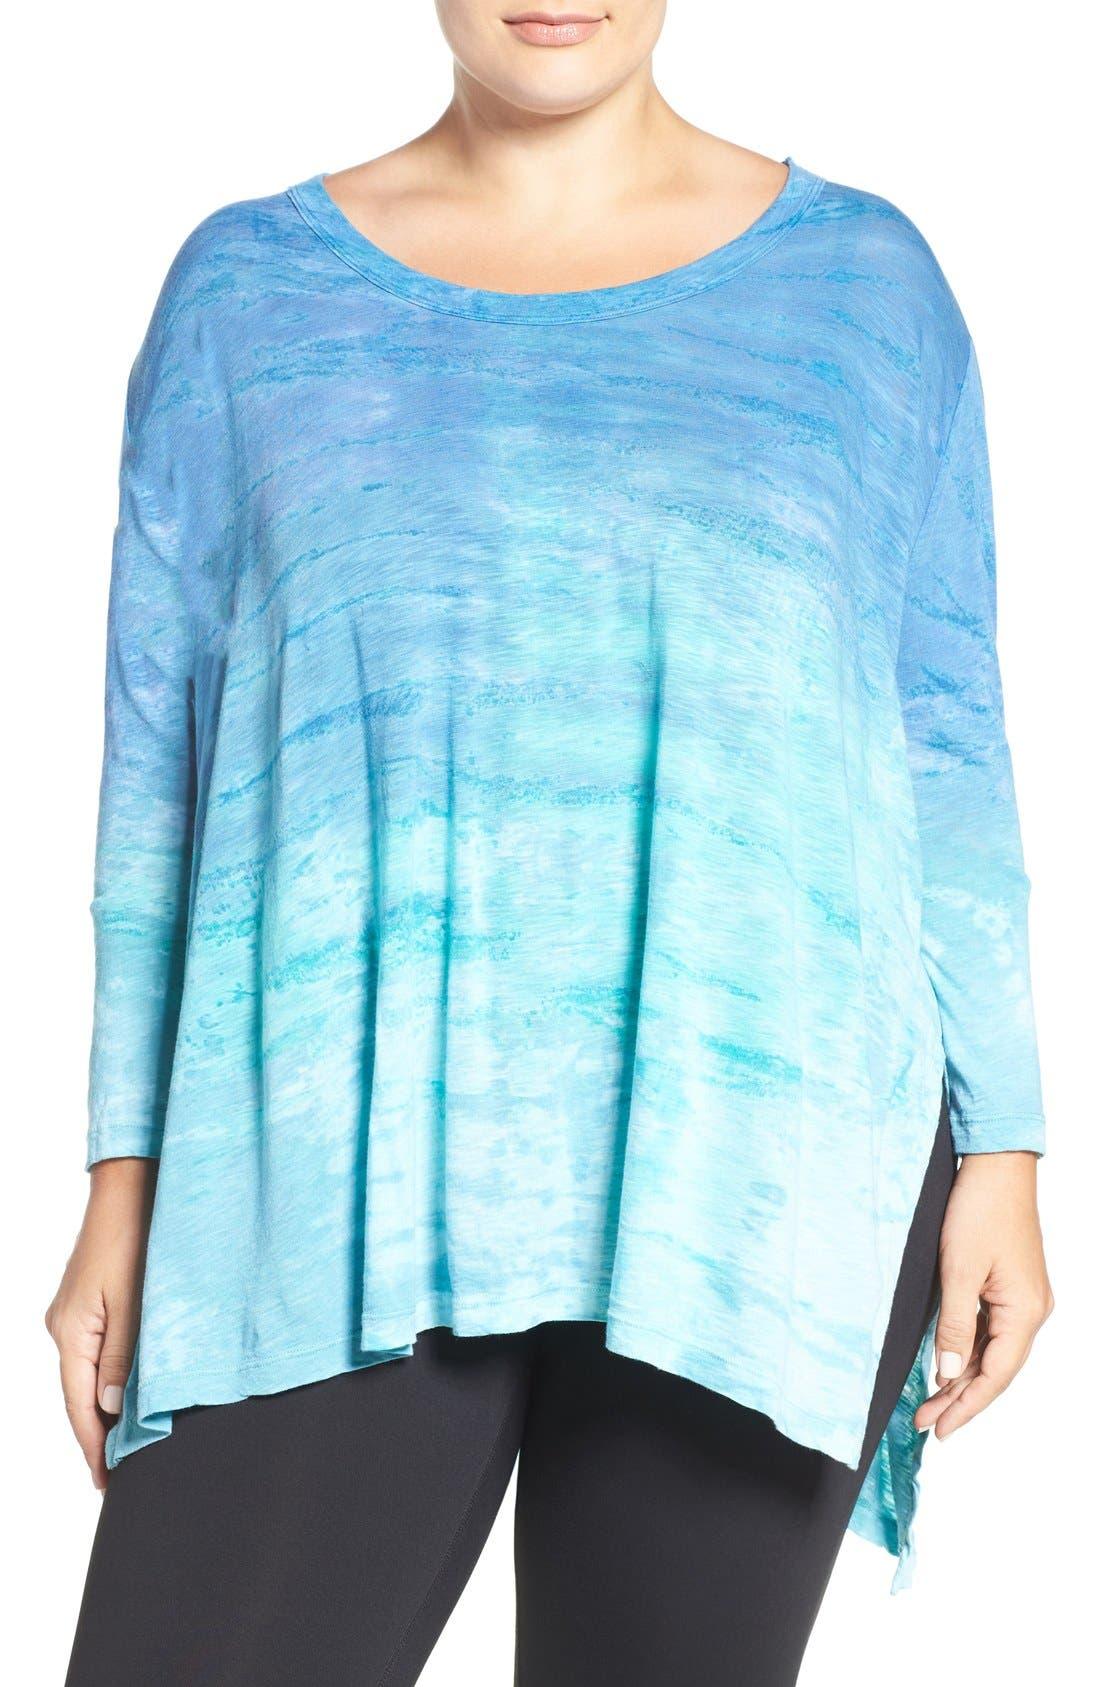 Alternate Image 1 Selected - Hard Tail Oversize Three-Quarter Sleeve Tee (Plus Size)